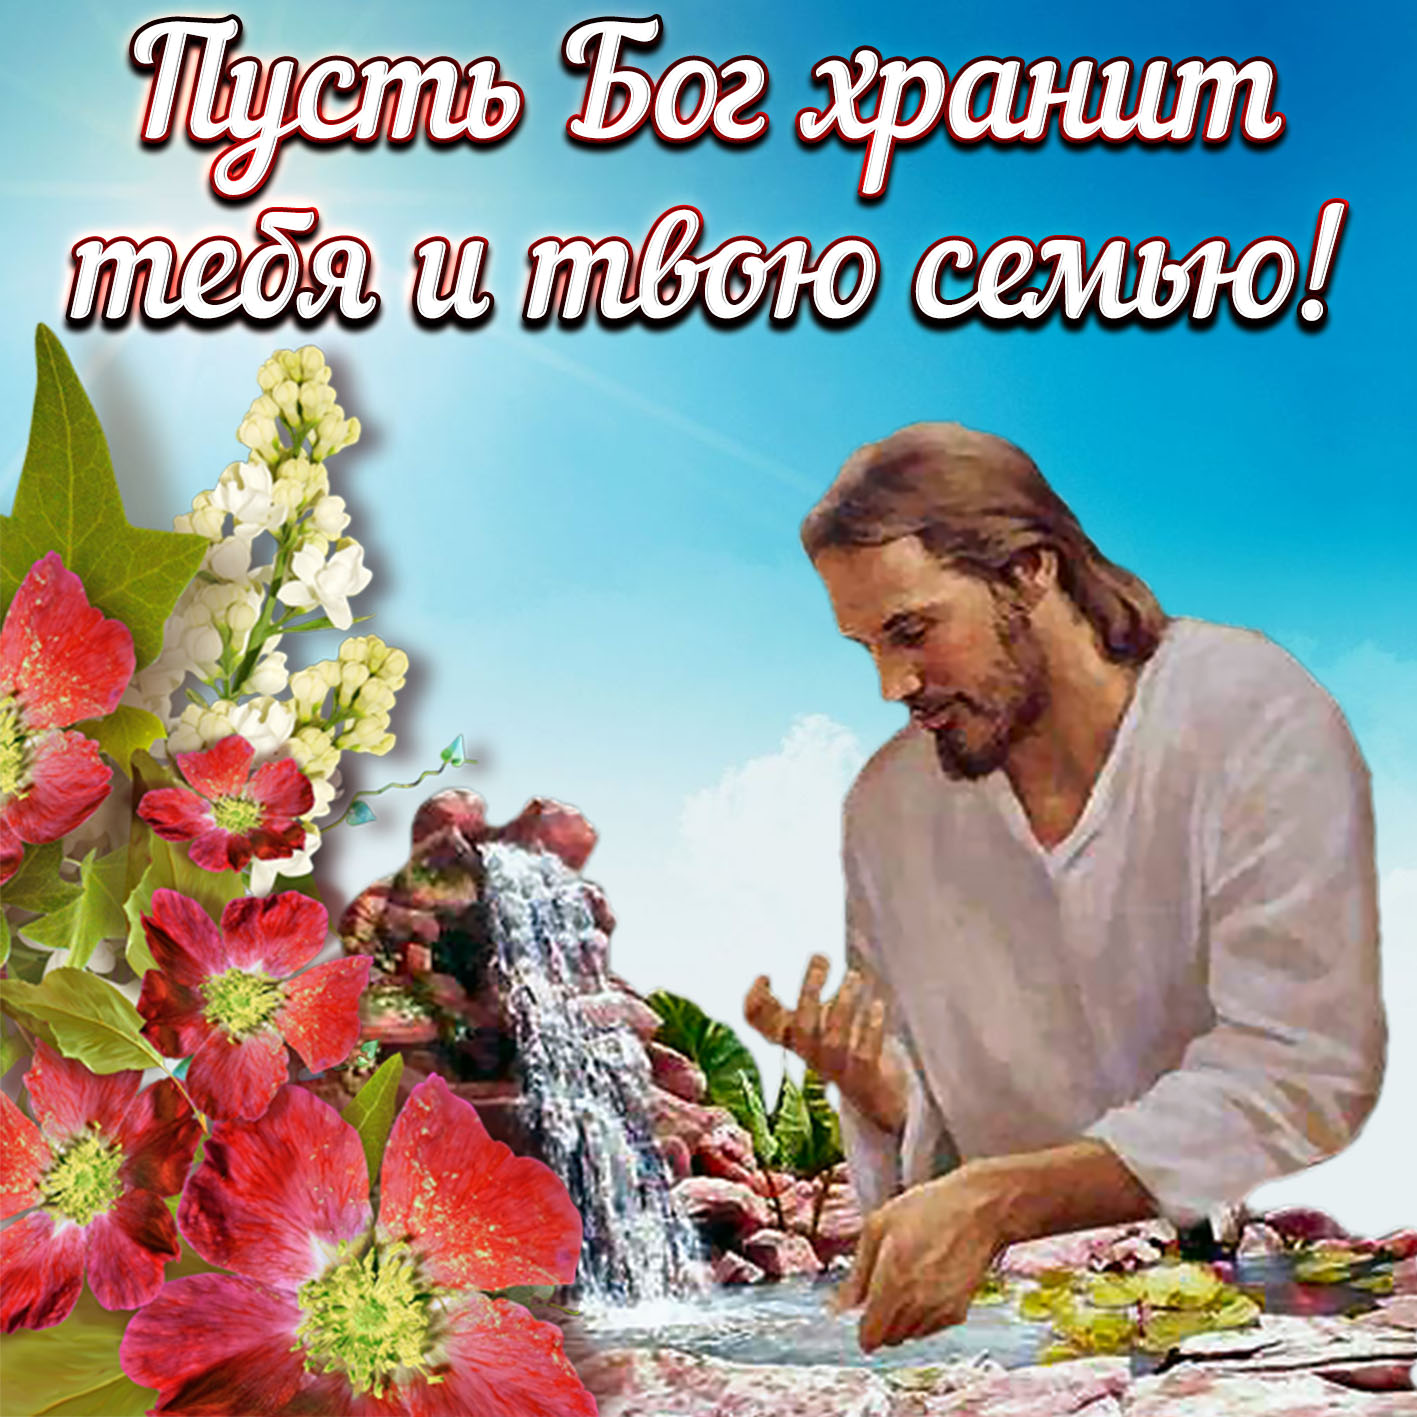 Фото пожелание храни тебя бог